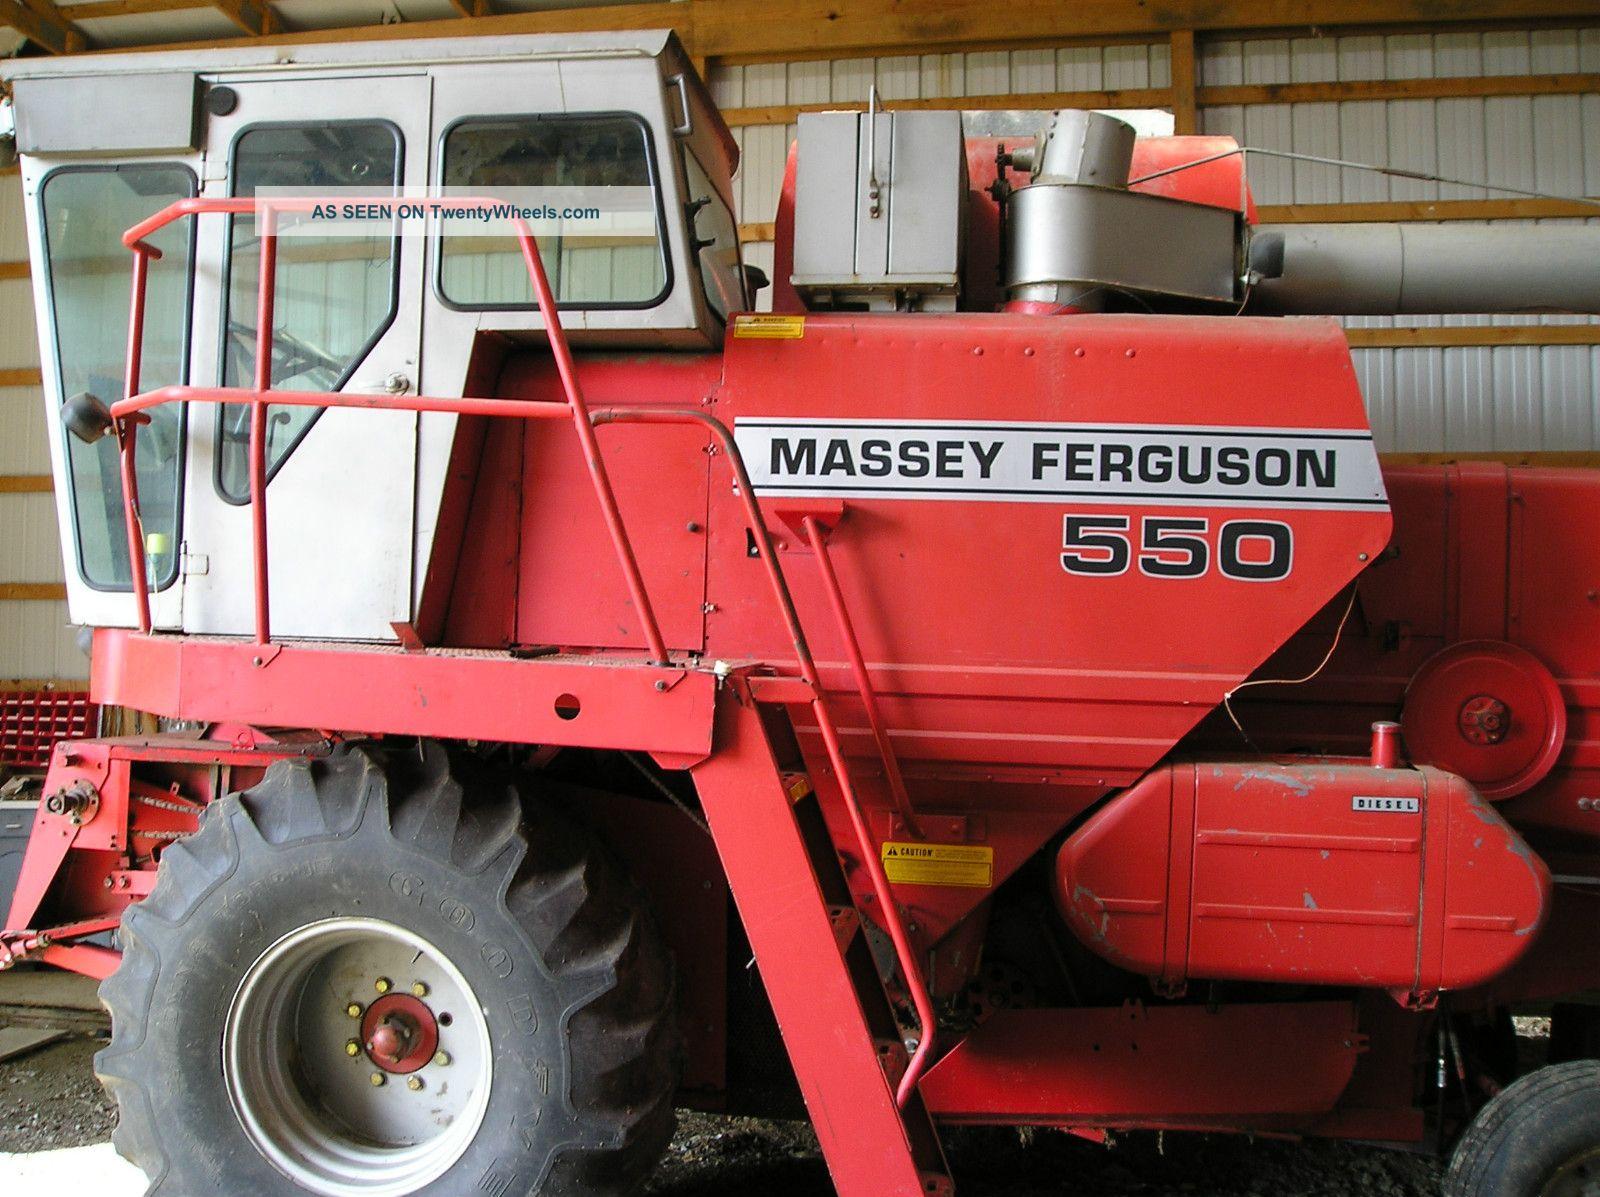 Massey Ferguson 550 Combine Combines photo